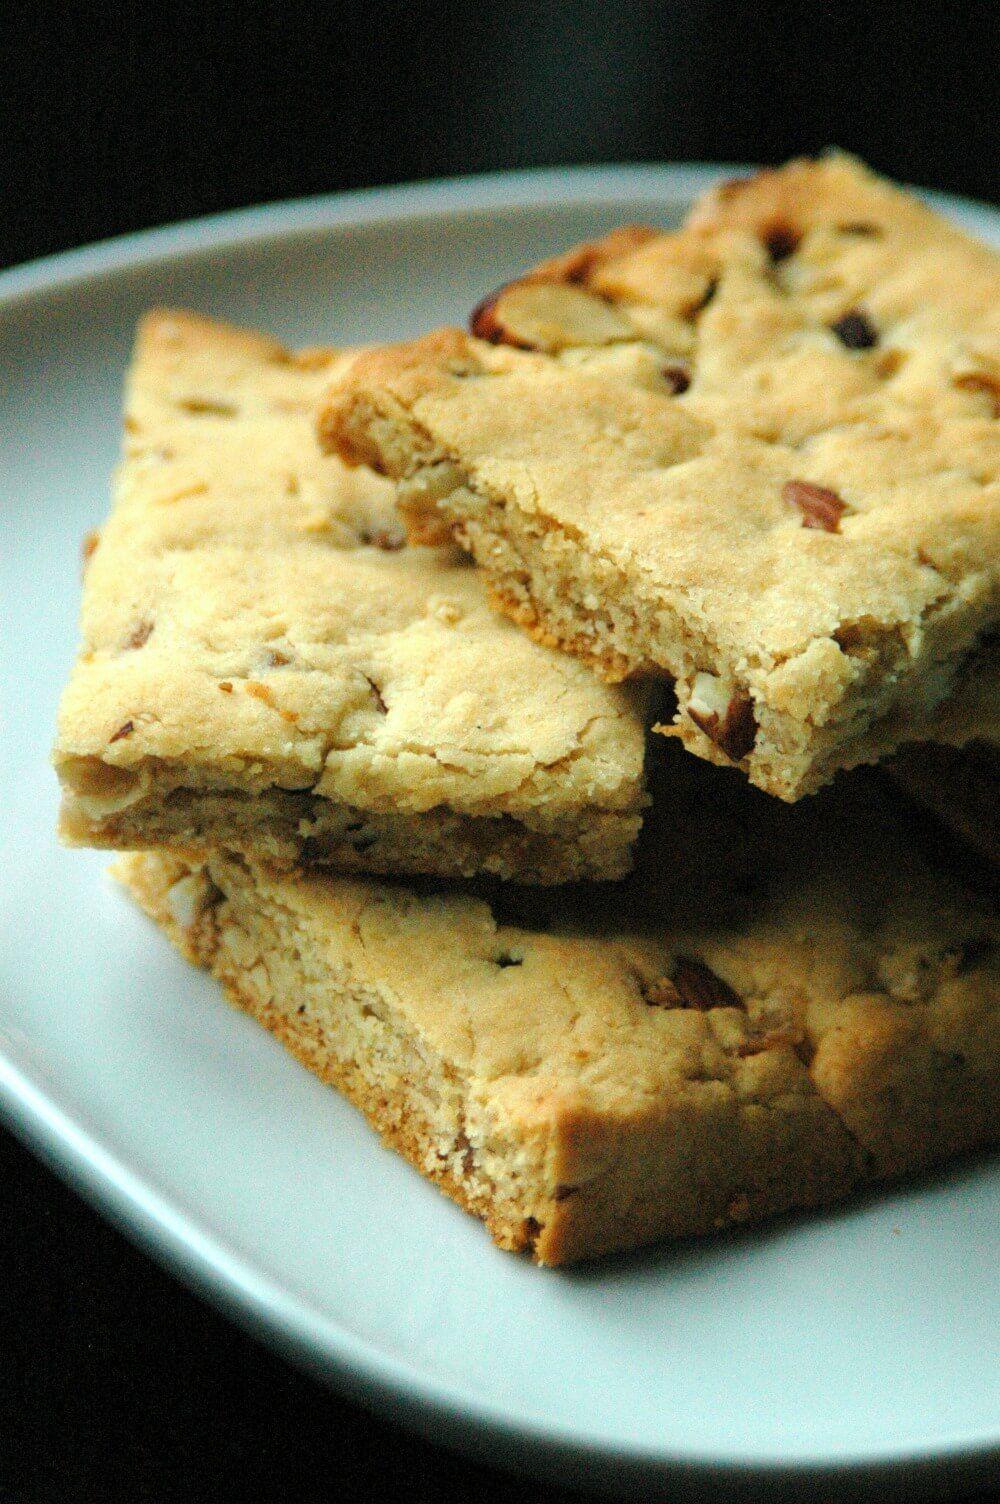 Honingkoekjes zonder suiker + alles wat jij lekker vindt! - Kookles Thuis